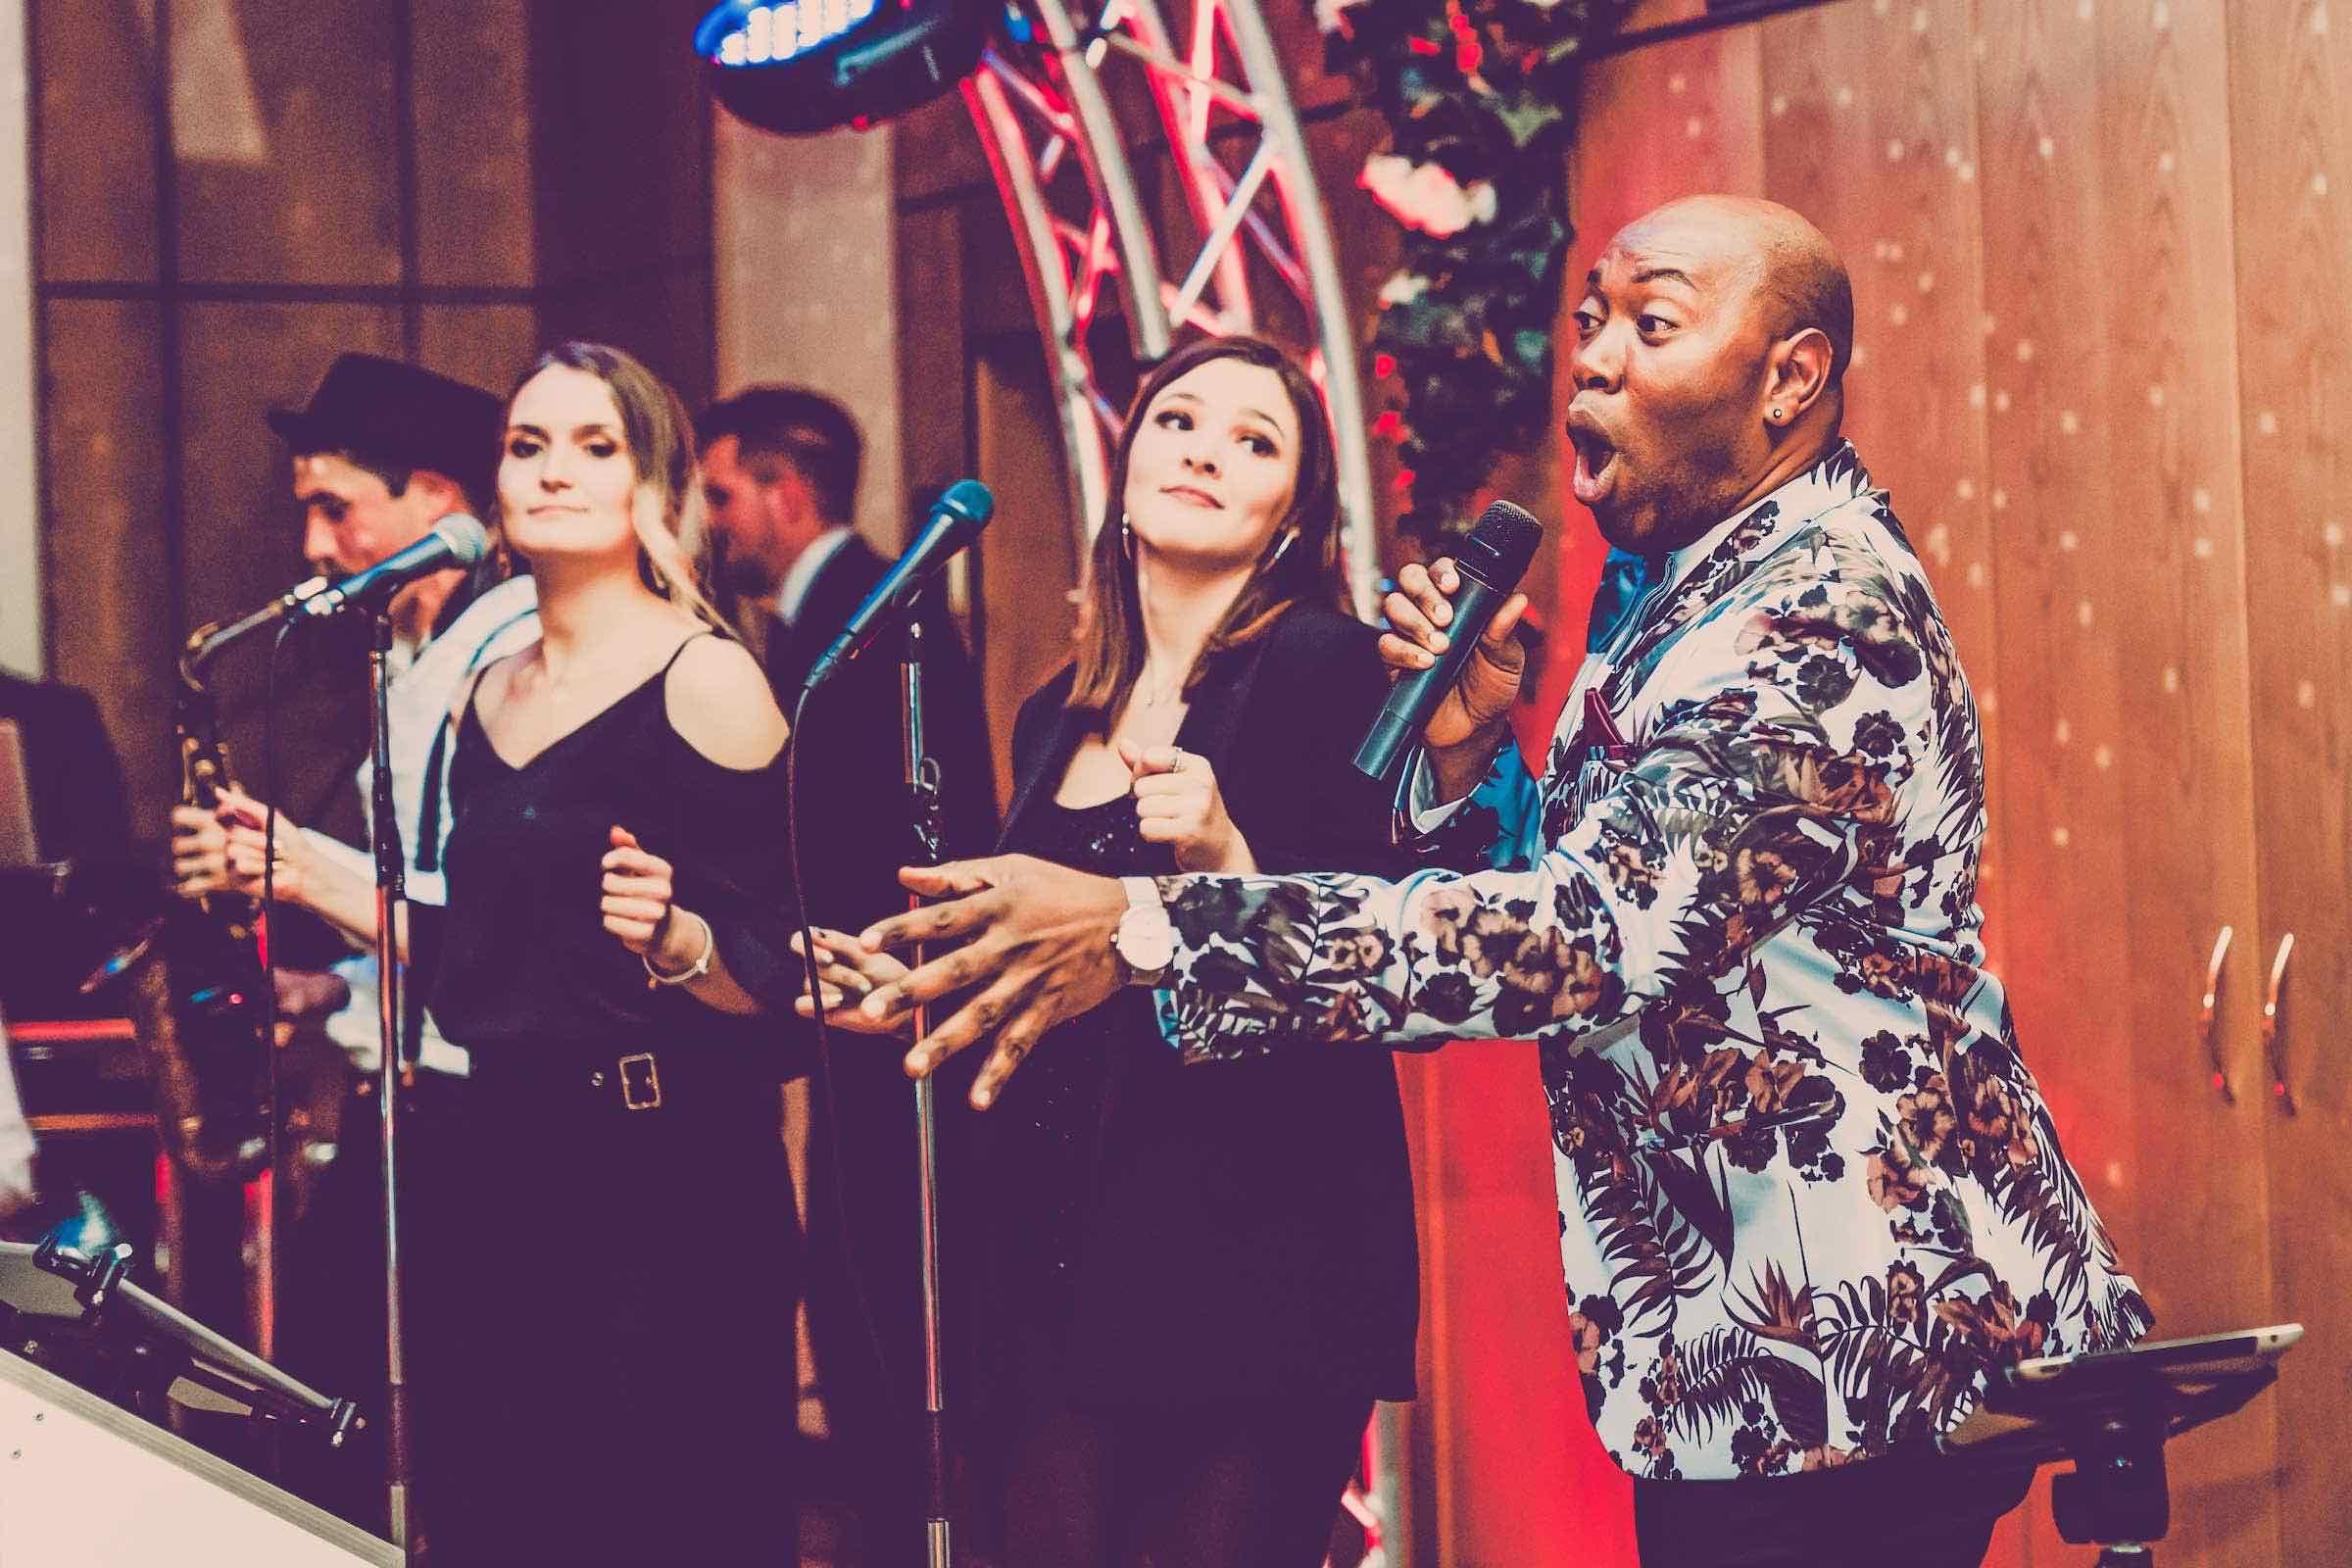 Band | Hamburg | Liveband | Livemusik | Brassband | Samba | Partyband | Jazzband | Swingband | Lounge | Popband | Jazz | Gesang | Sänger | Frontsänger | Hochzeit | Trauung | Messe | Firmenfeier | Charity | Gala | Hamburgfeiert